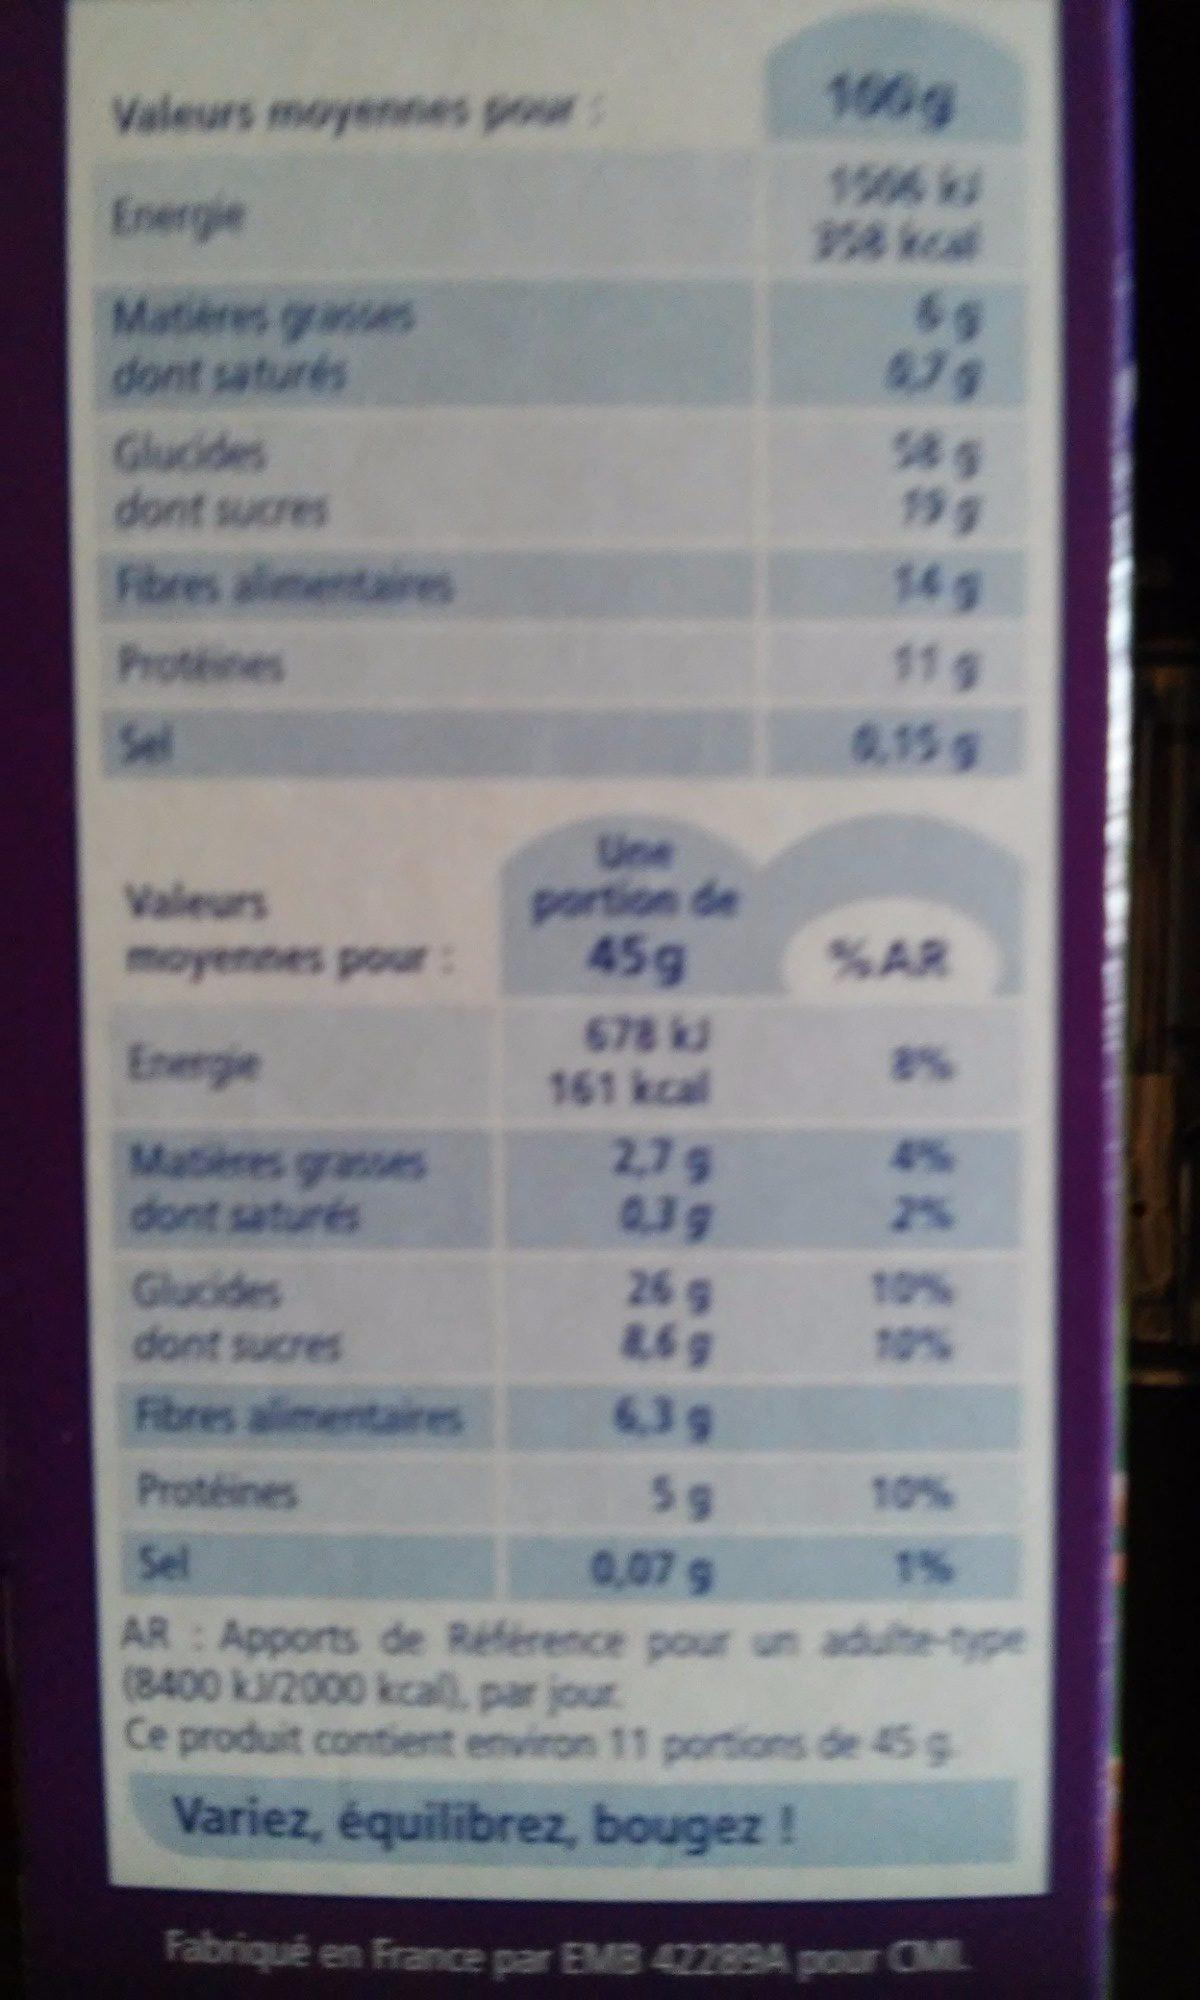 Bio muesli - Ingredients